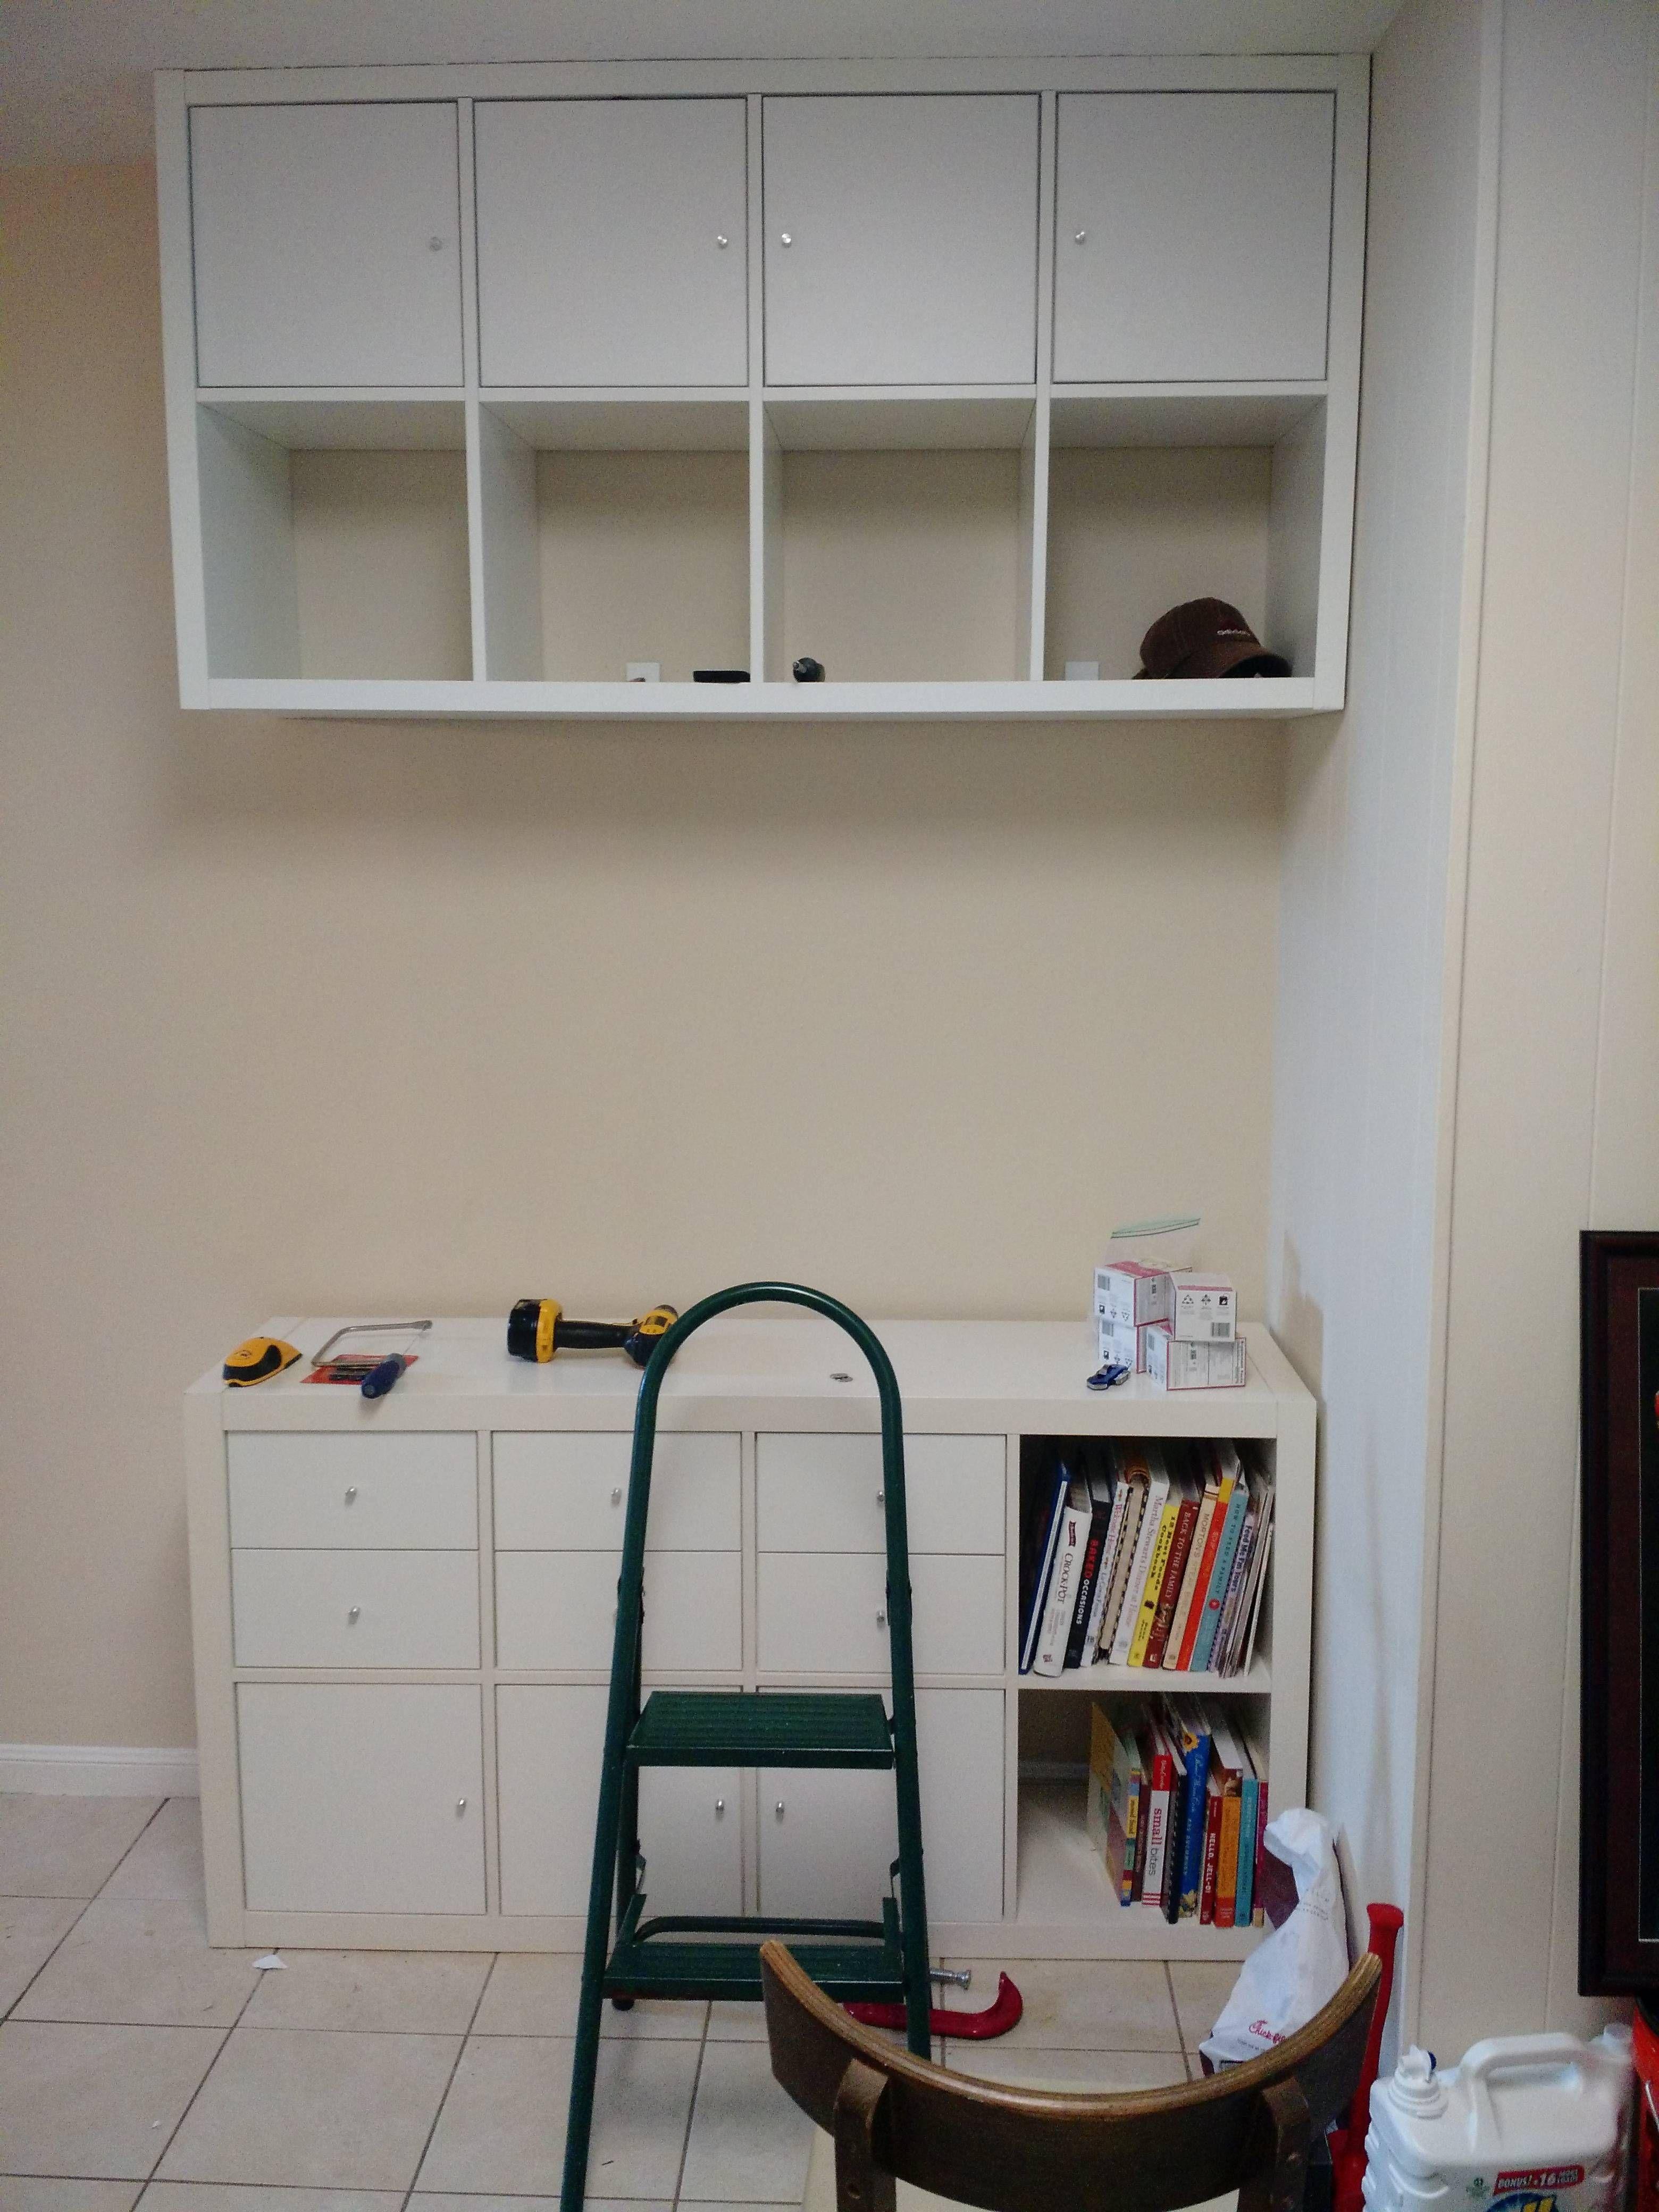 Turn an Ikea Kallax into an overhead cabinet/storage system!